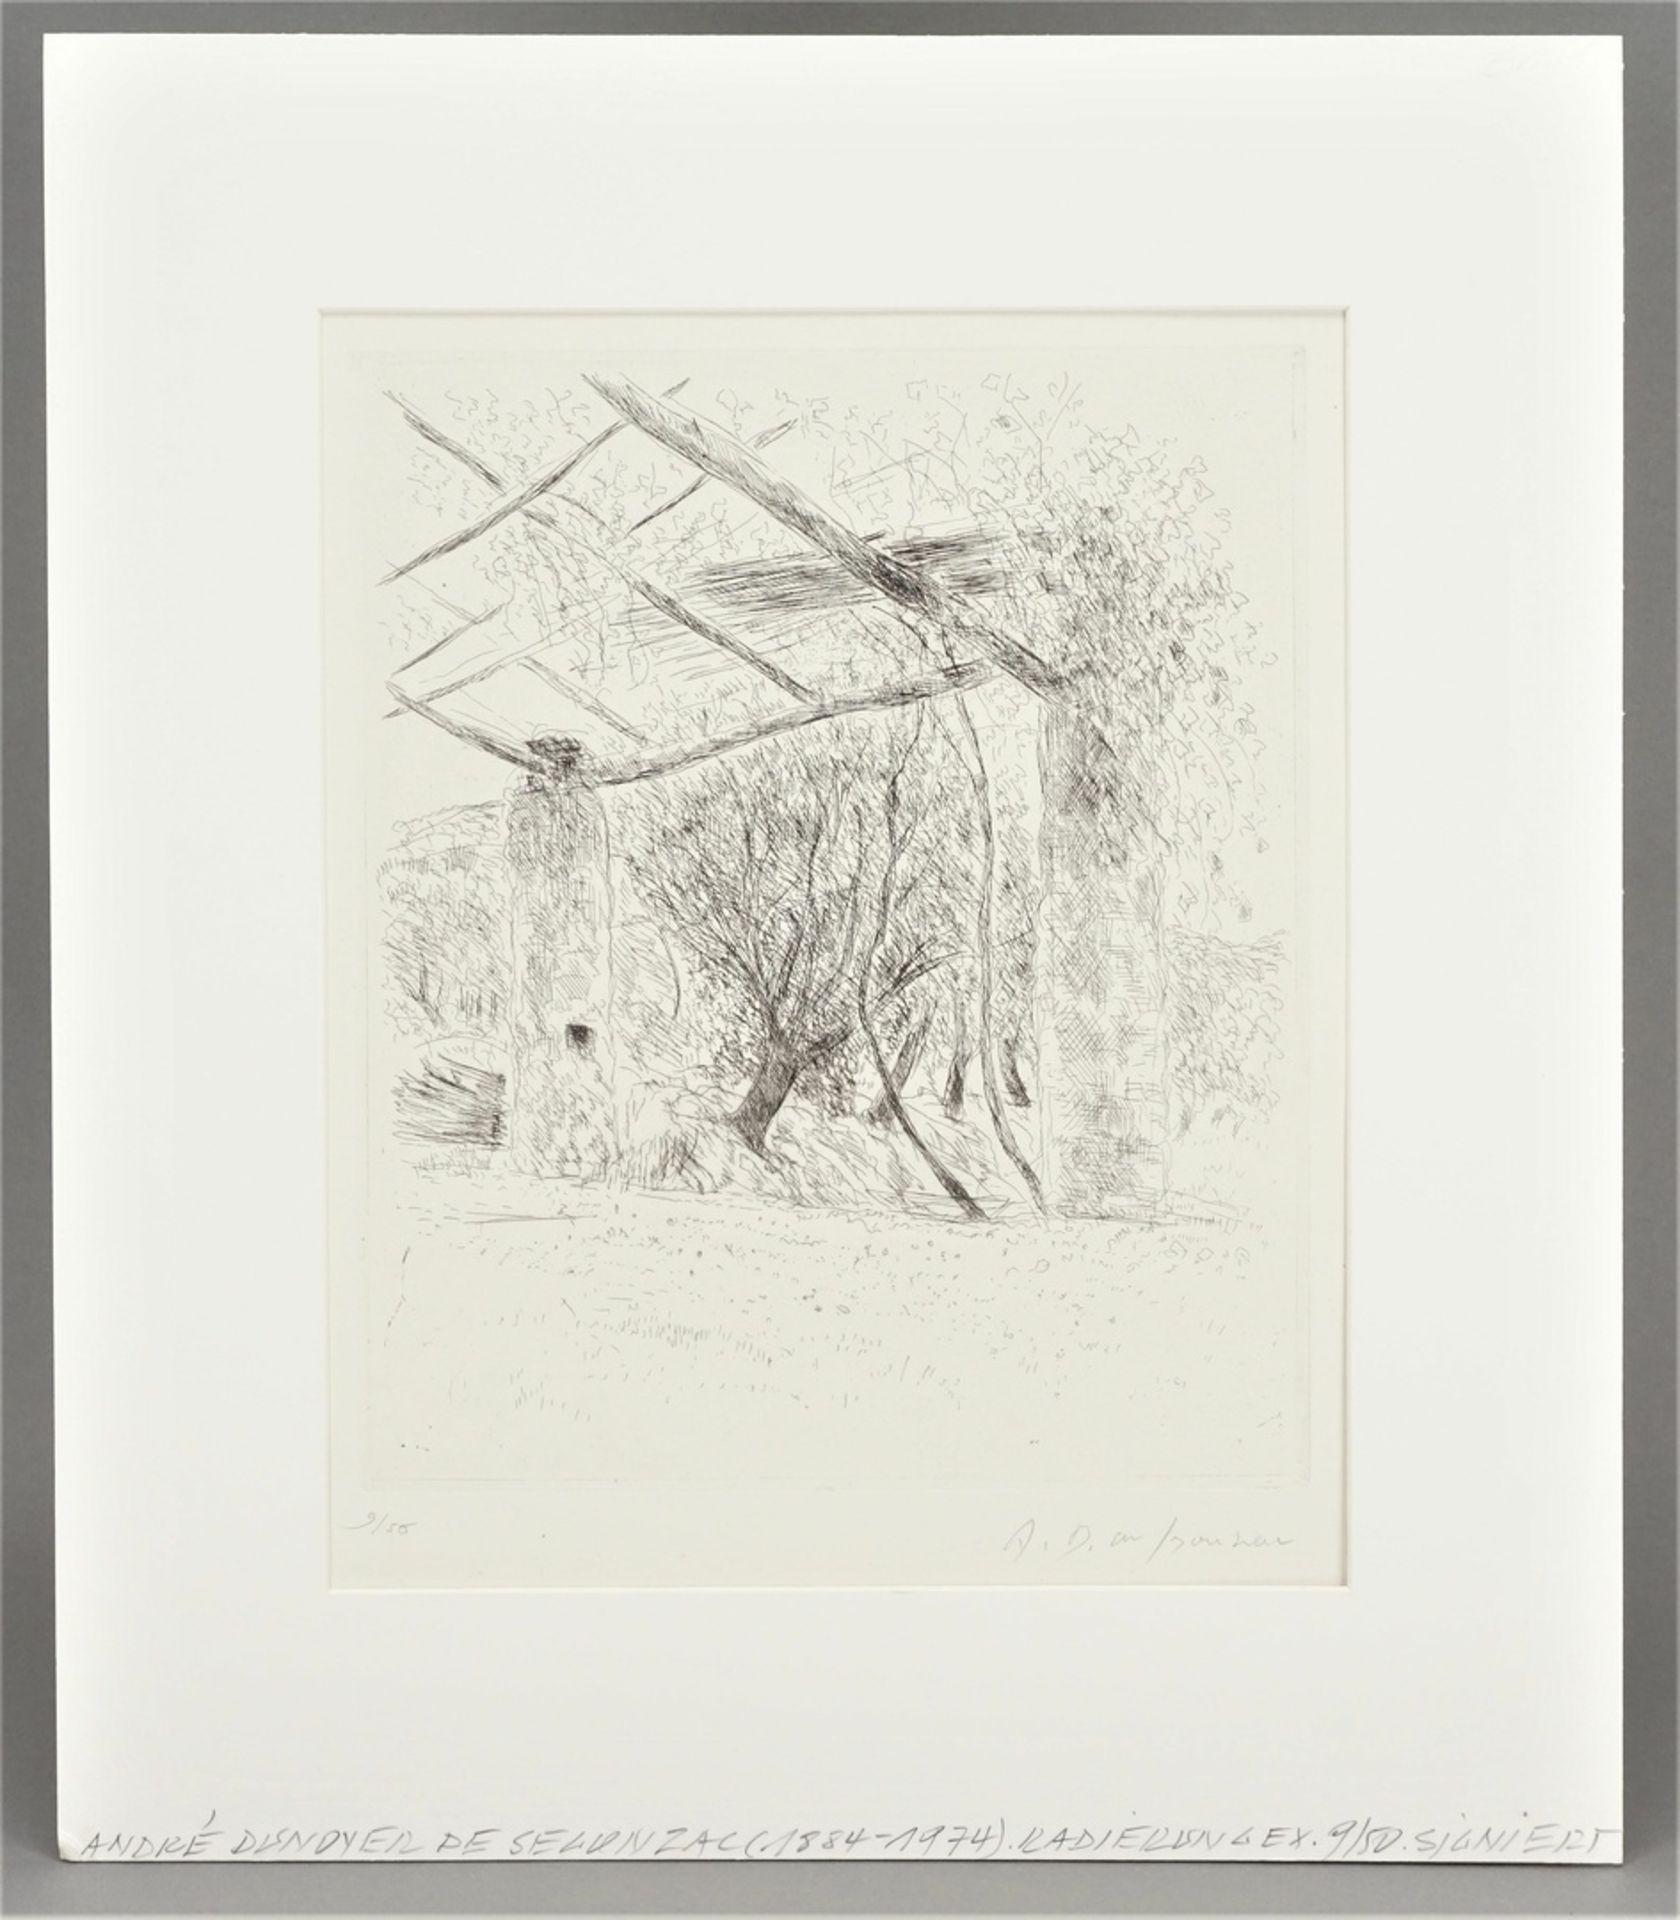 André Dunoyer De Segonzac, Gartenecke - Bild 2 aus 4